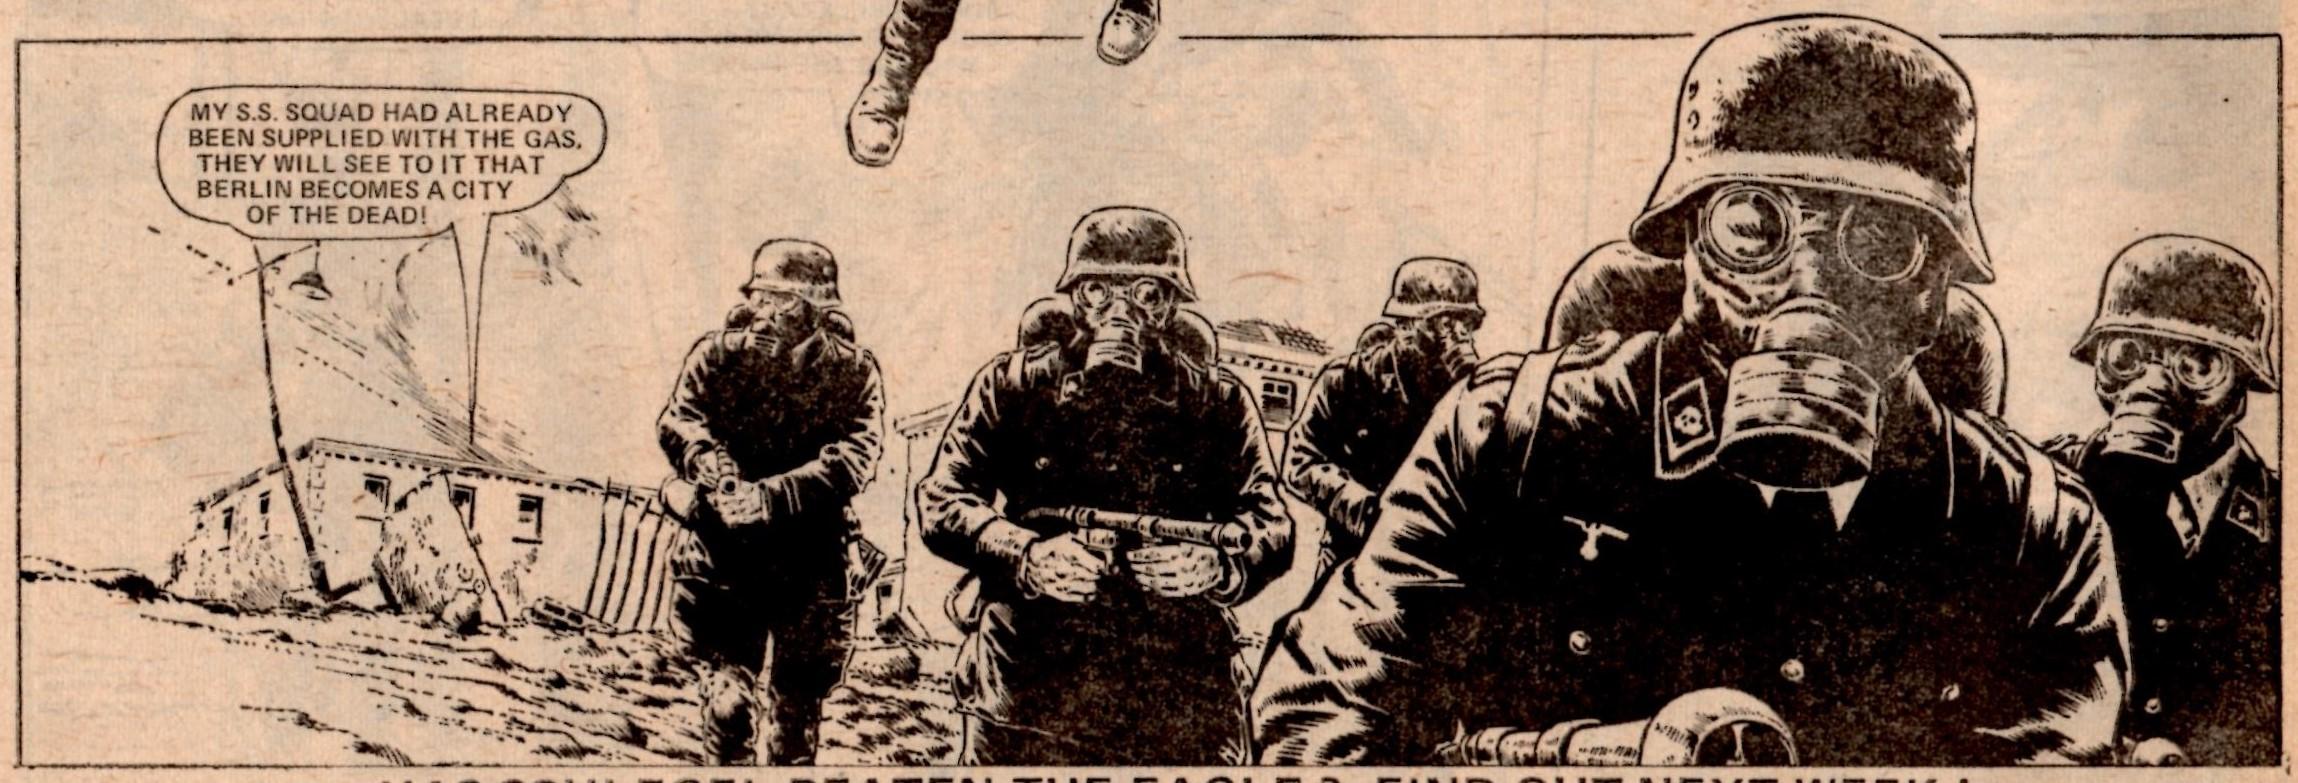 Operation Black Death: Chris Lowder (writer), Pat Wright (artist)